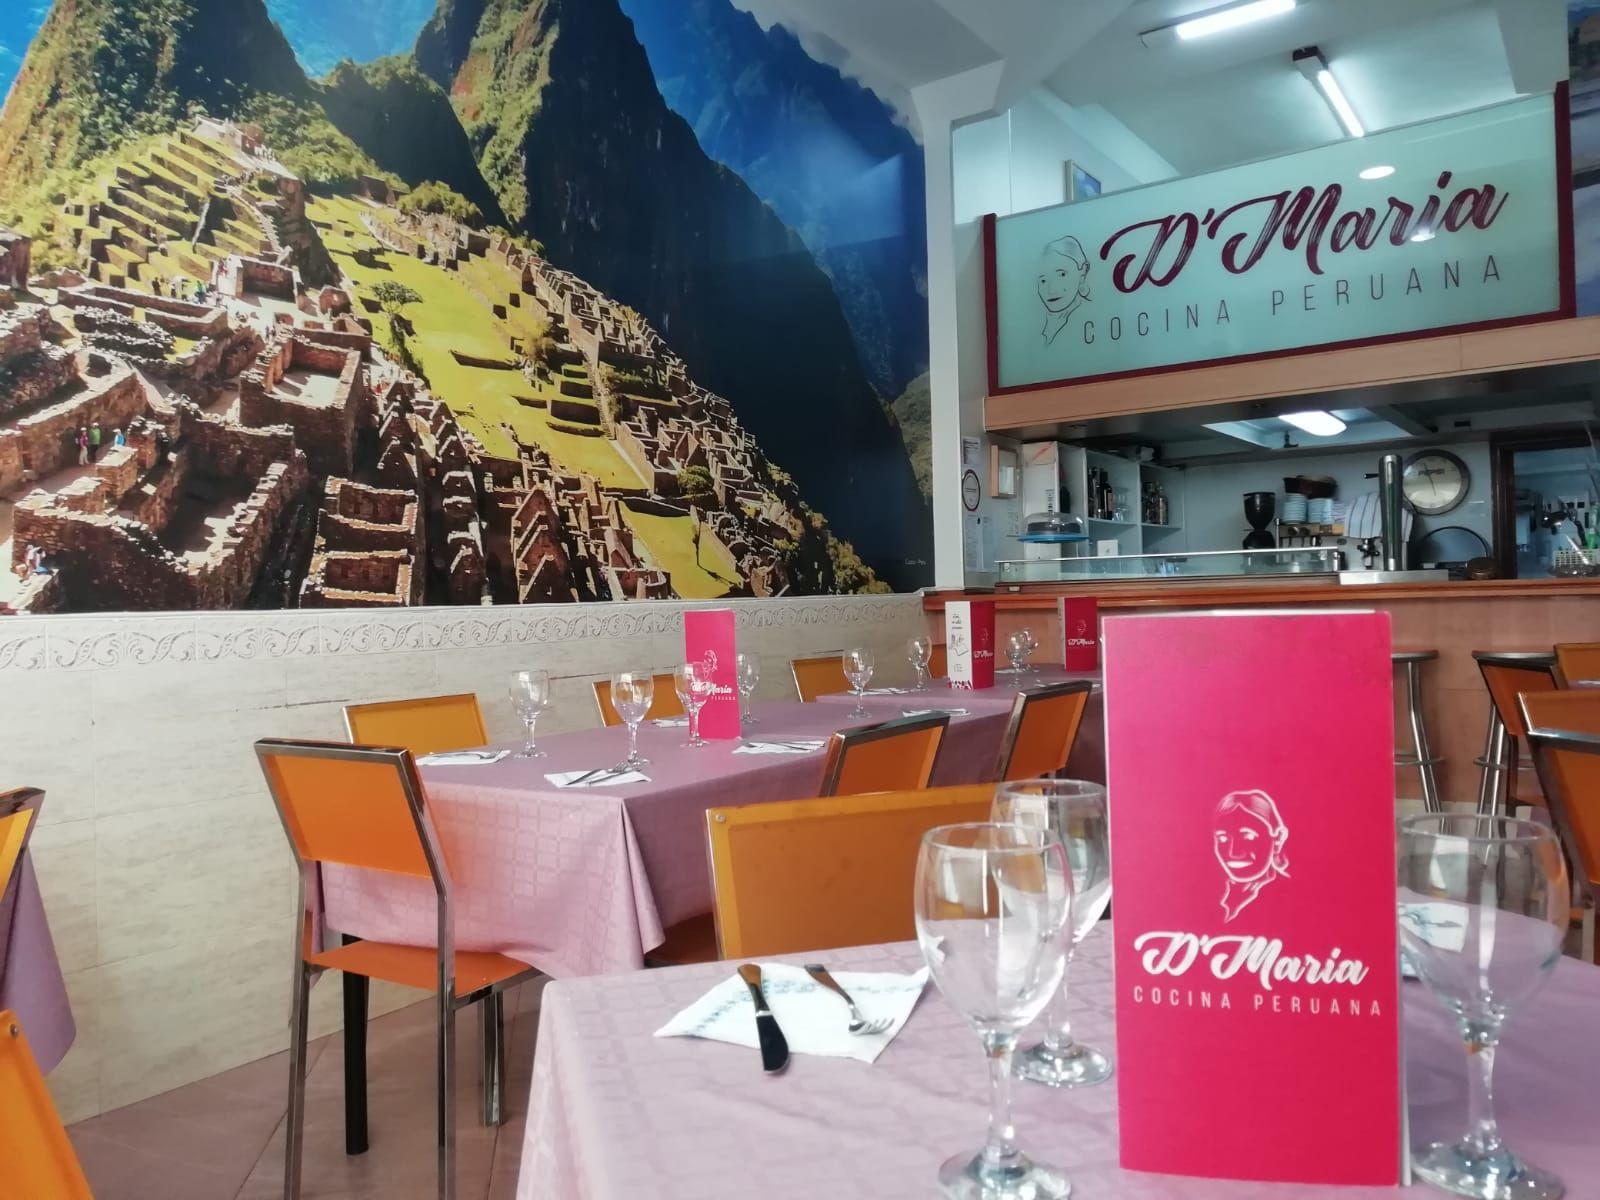 Foto 142 de Cocina peruana en  | TIKA MARIYA